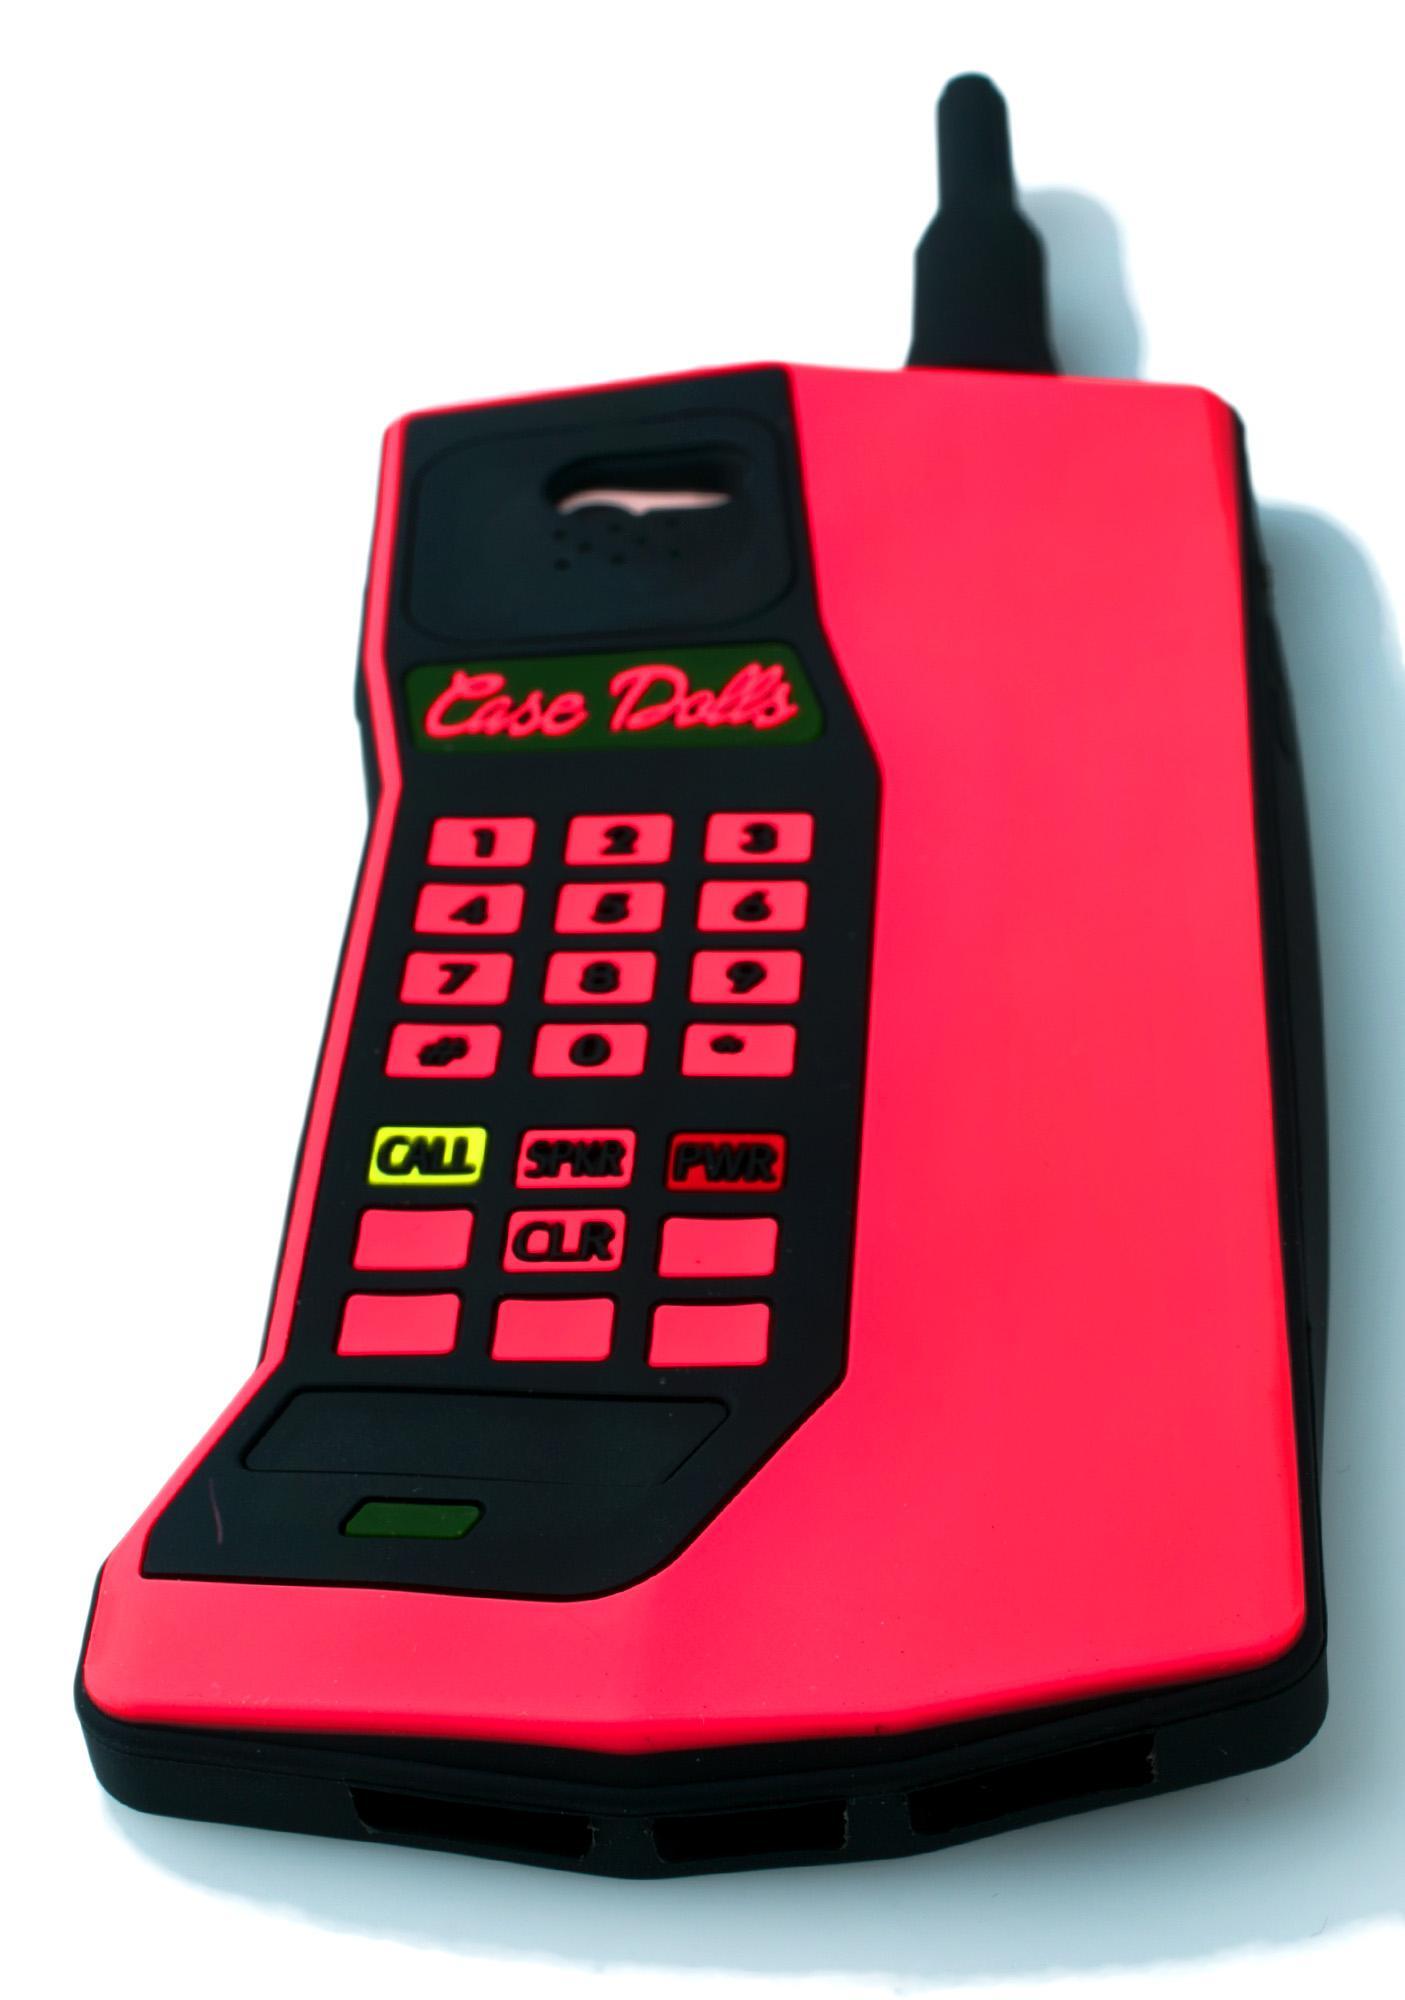 Case Dolls Brick Phone iPhone Case